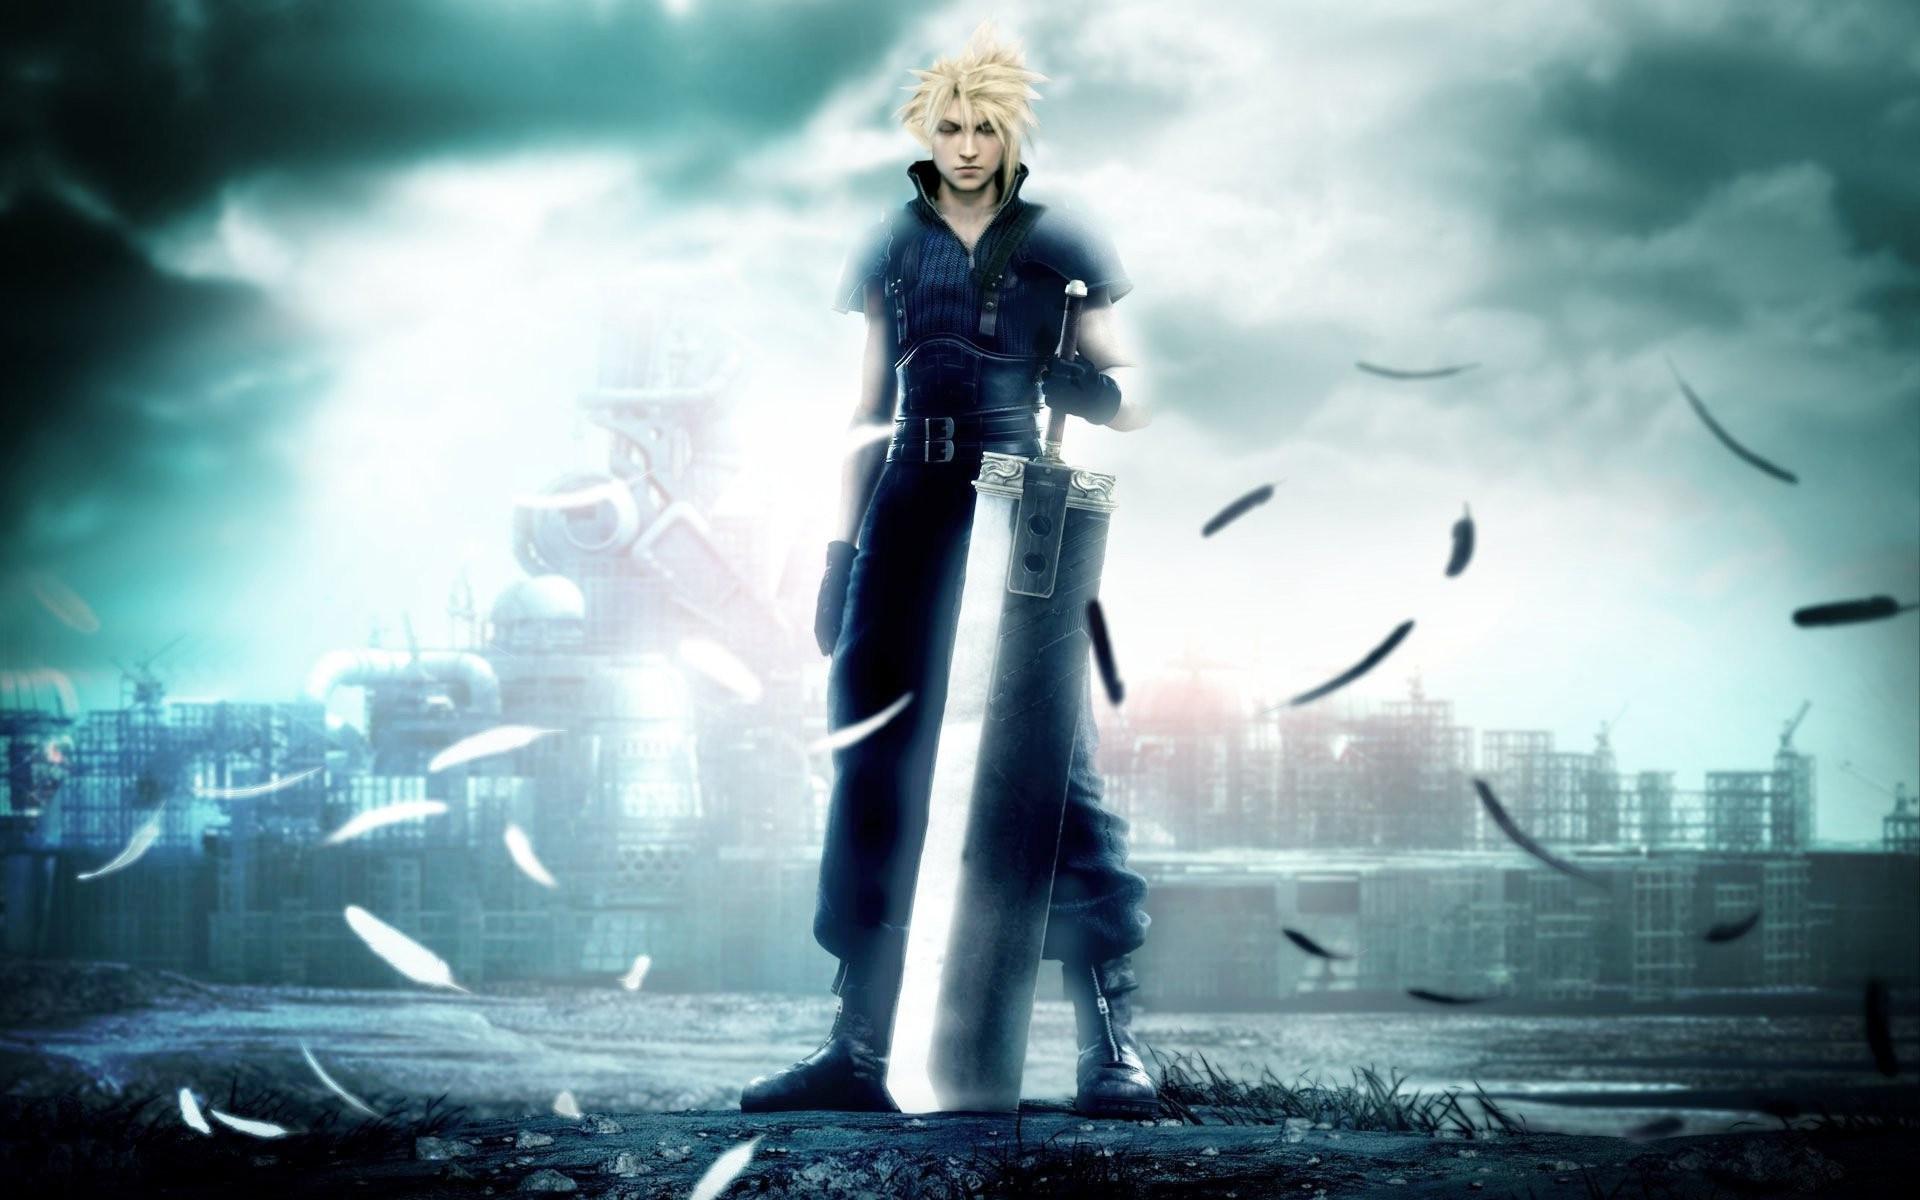 Final Fantasy VII 19 Wallpaper HD[1] 1920x1200